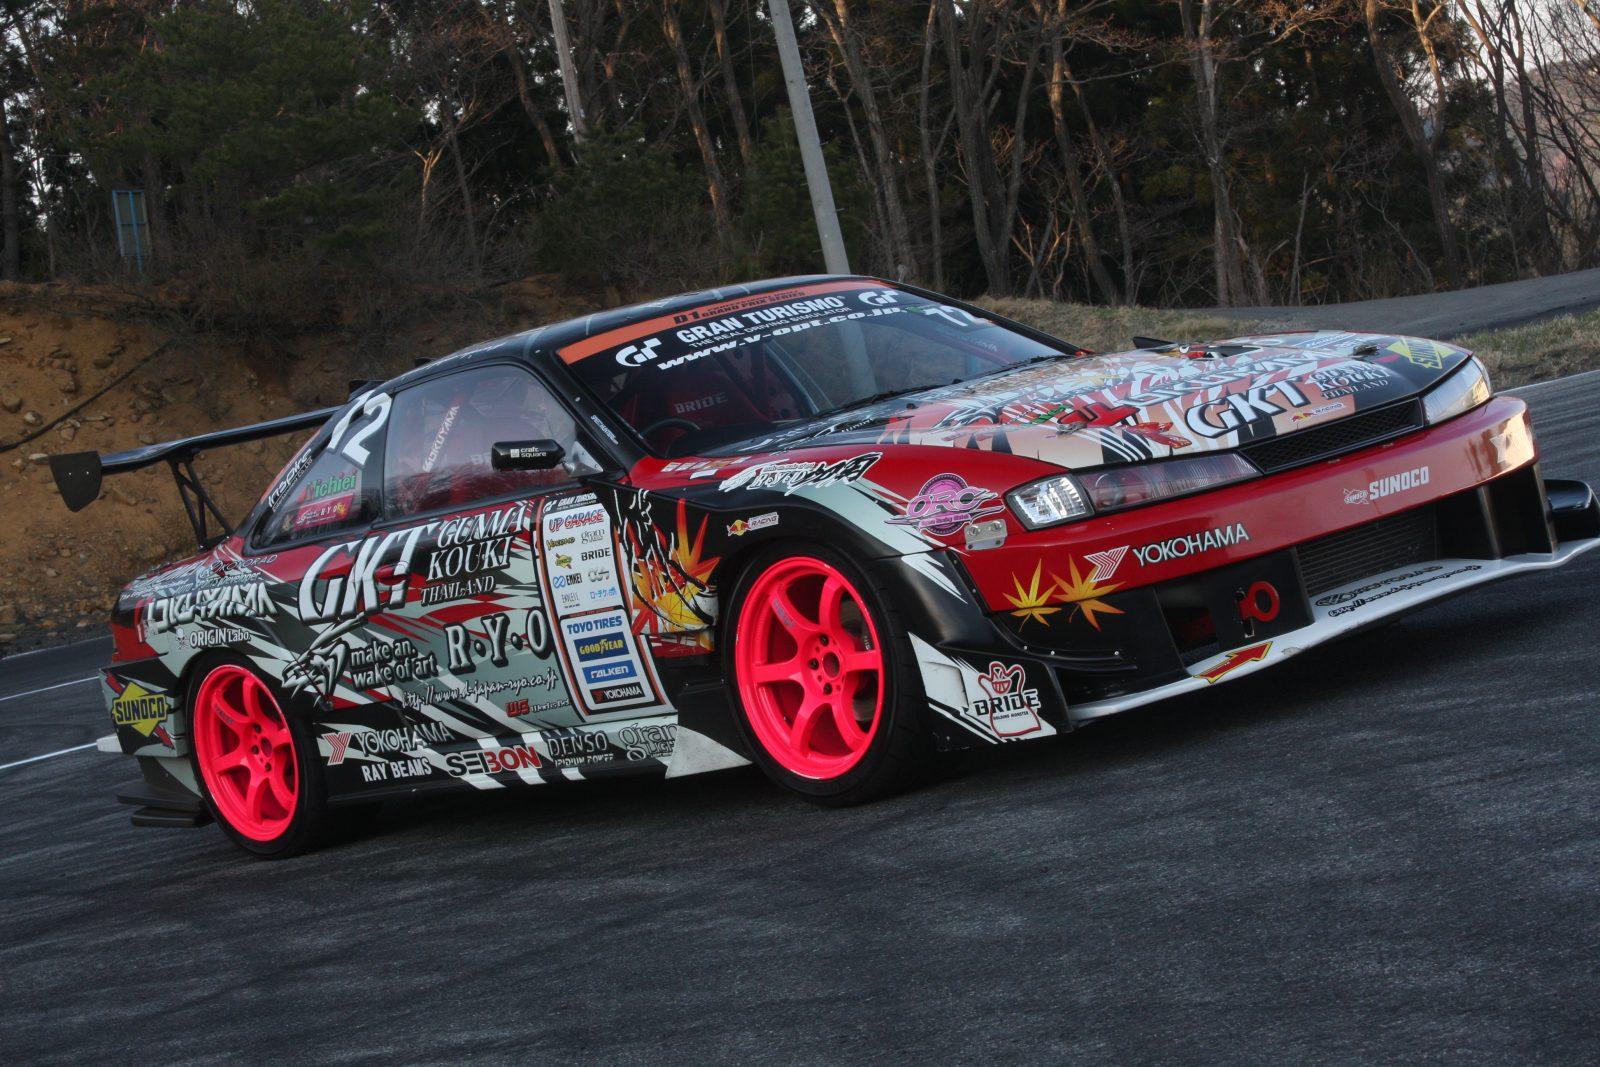 Cars For Sale Uk Drift: Nissan Silvia S14 D1 R.Y.O Drift Car